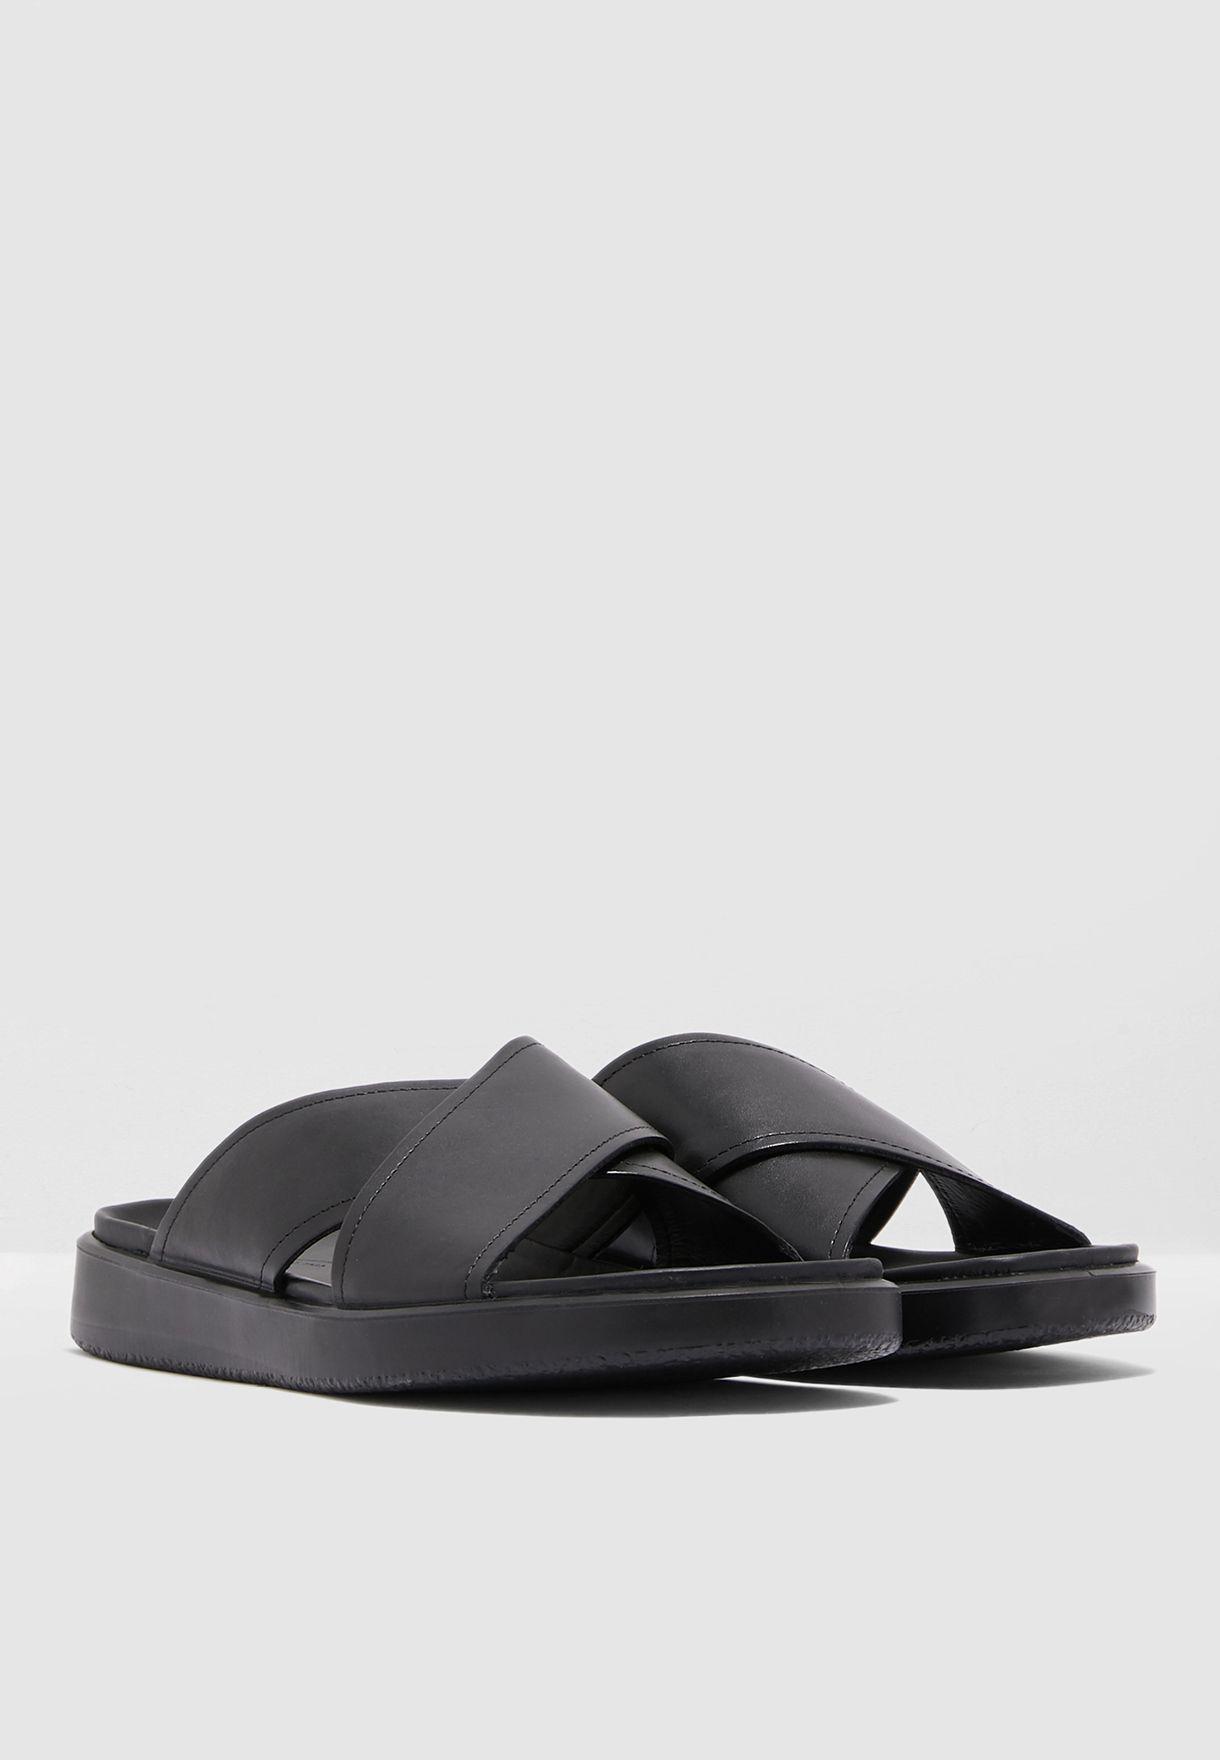 Flowt LX Cross Strap Slide Sandals